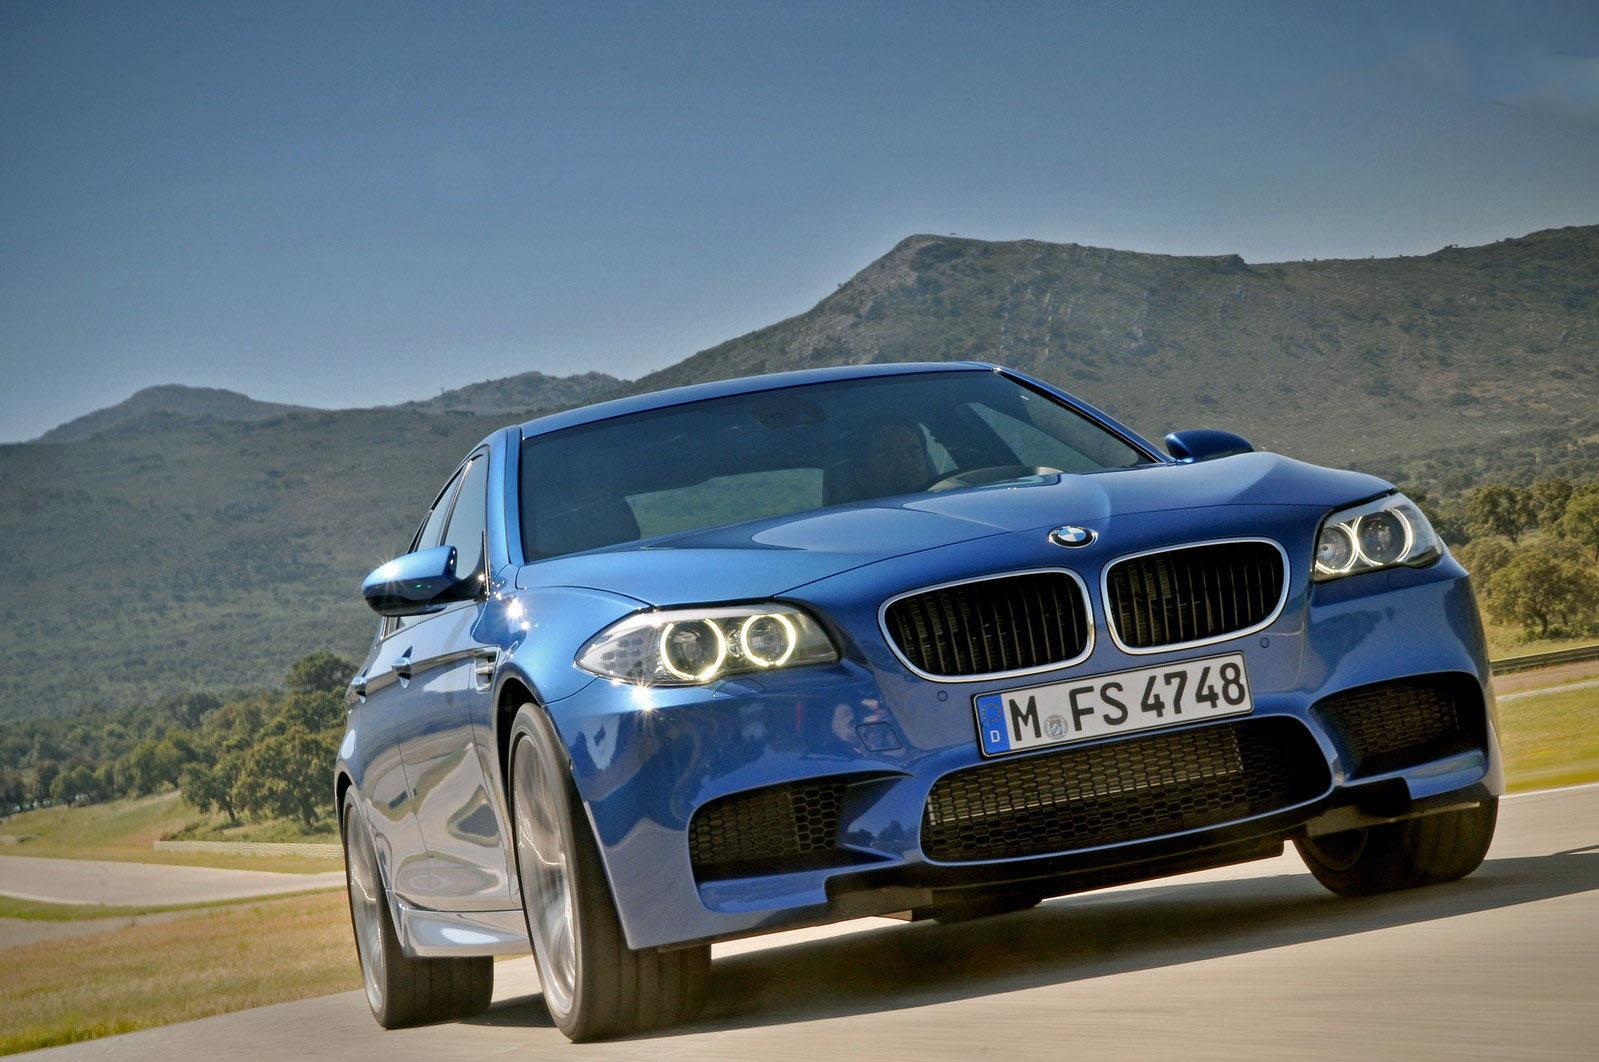 car i 2013 BMW M5 vs 2013 BMW M6 Coupe